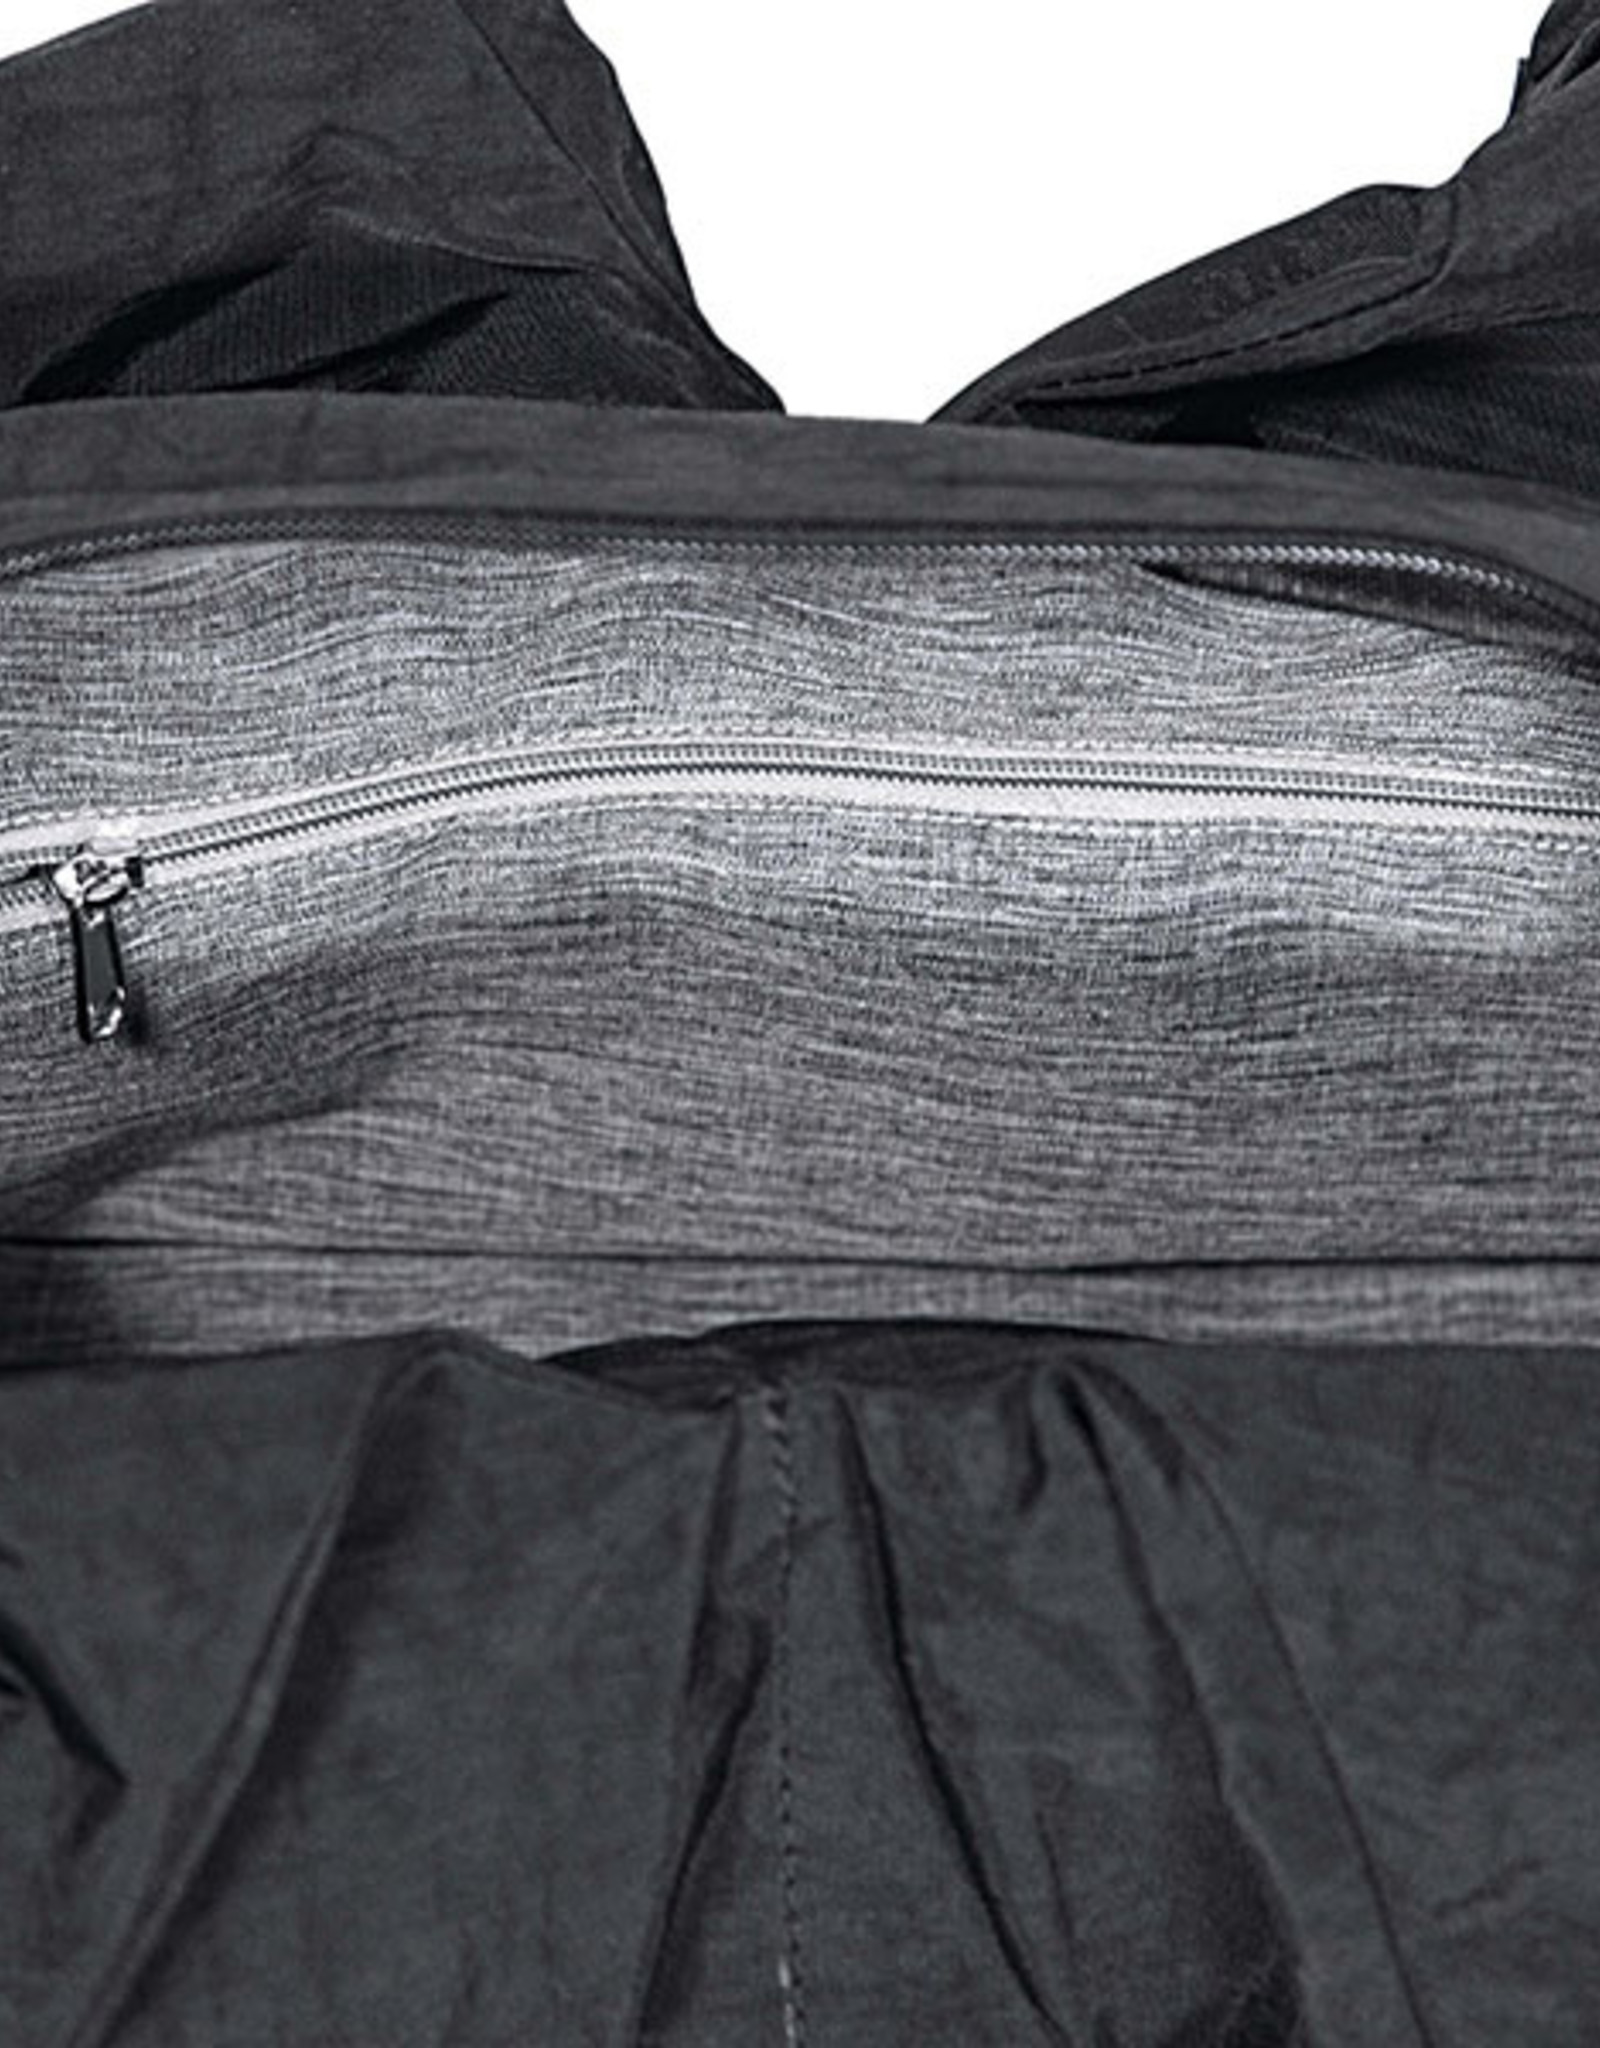 Eurotard Tote-Ally Chic Gym Bag